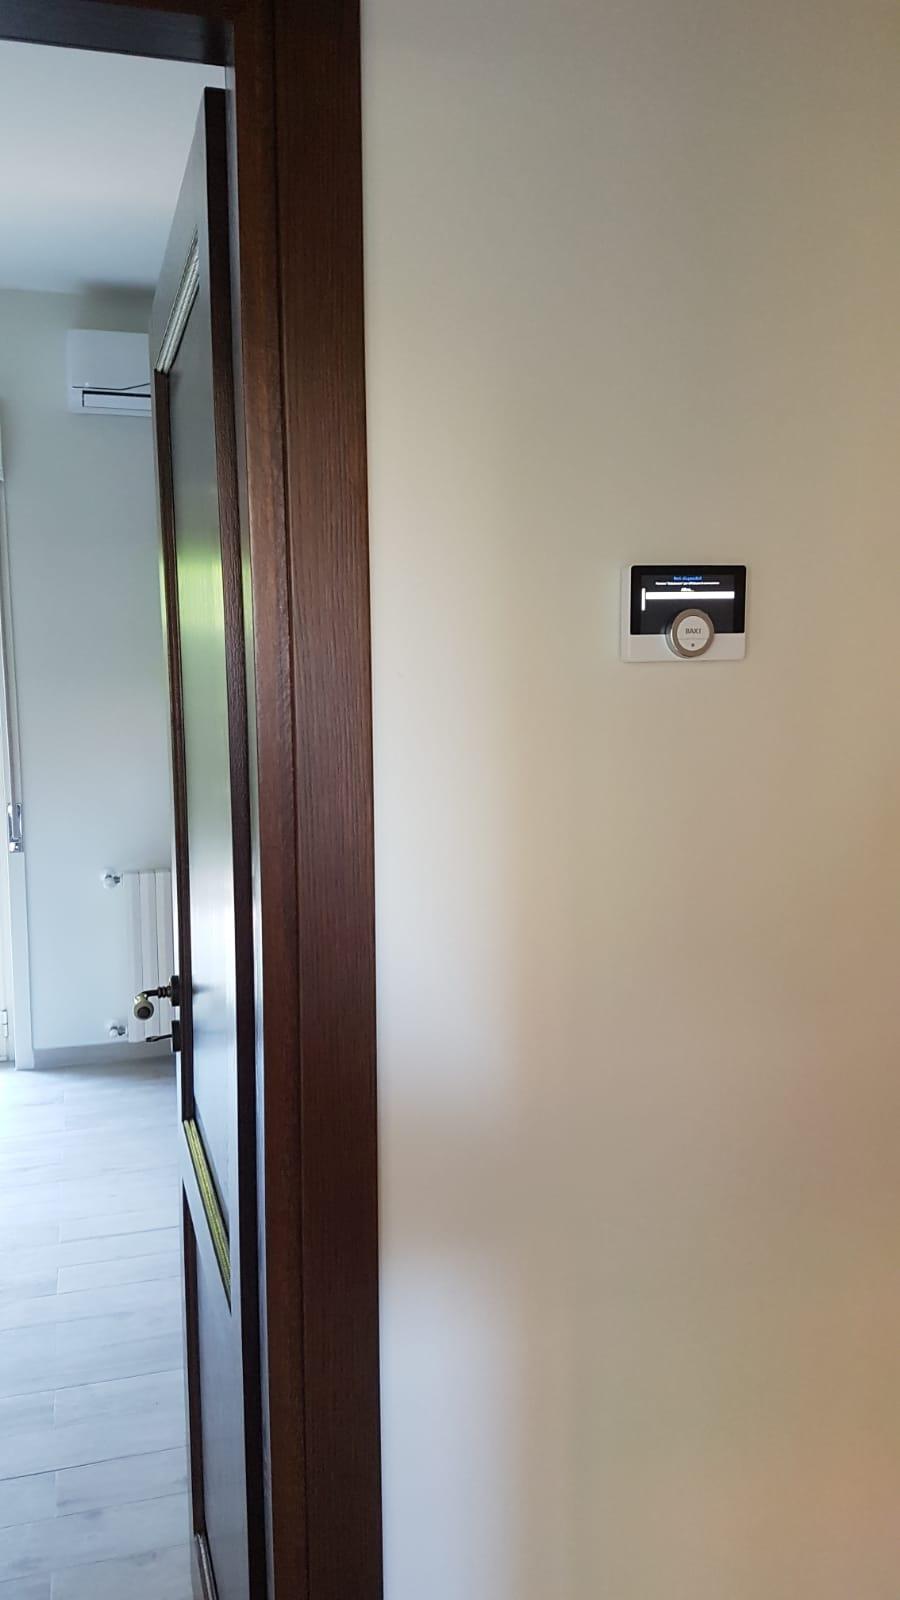 Cronotermostato Baxi MAgo installazione indoor